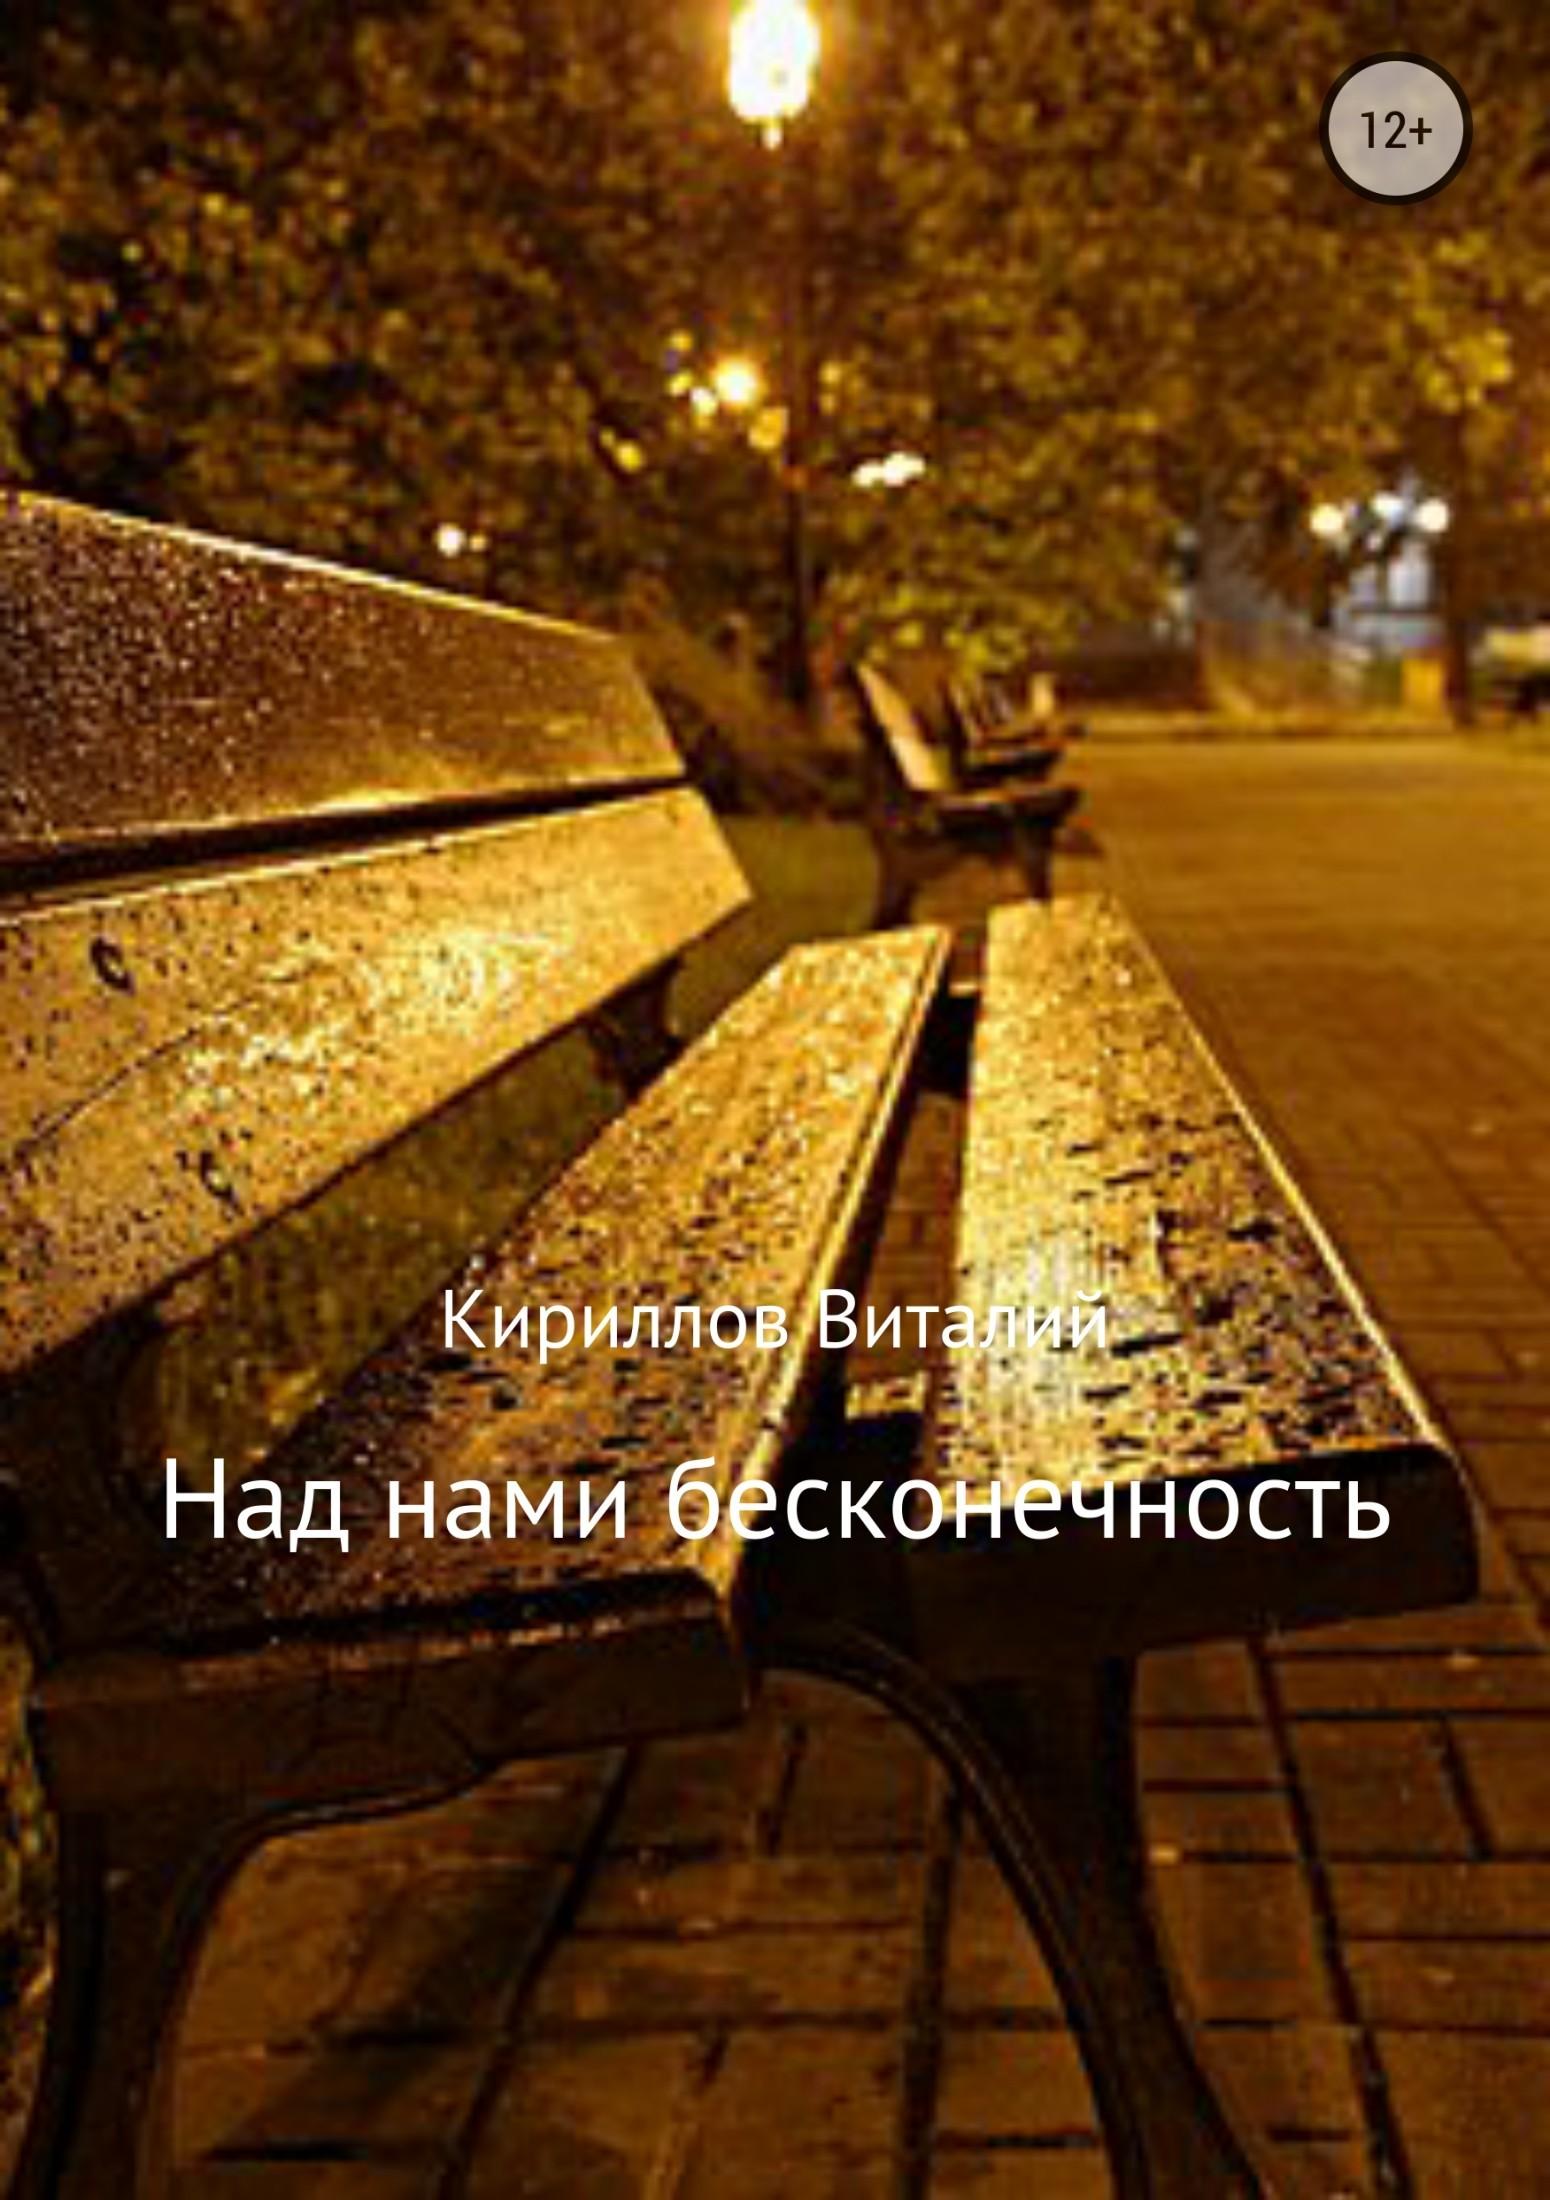 Виталий Александрович Кириллов Над нами бесконечность виталий александрович кириллов антраст белый город